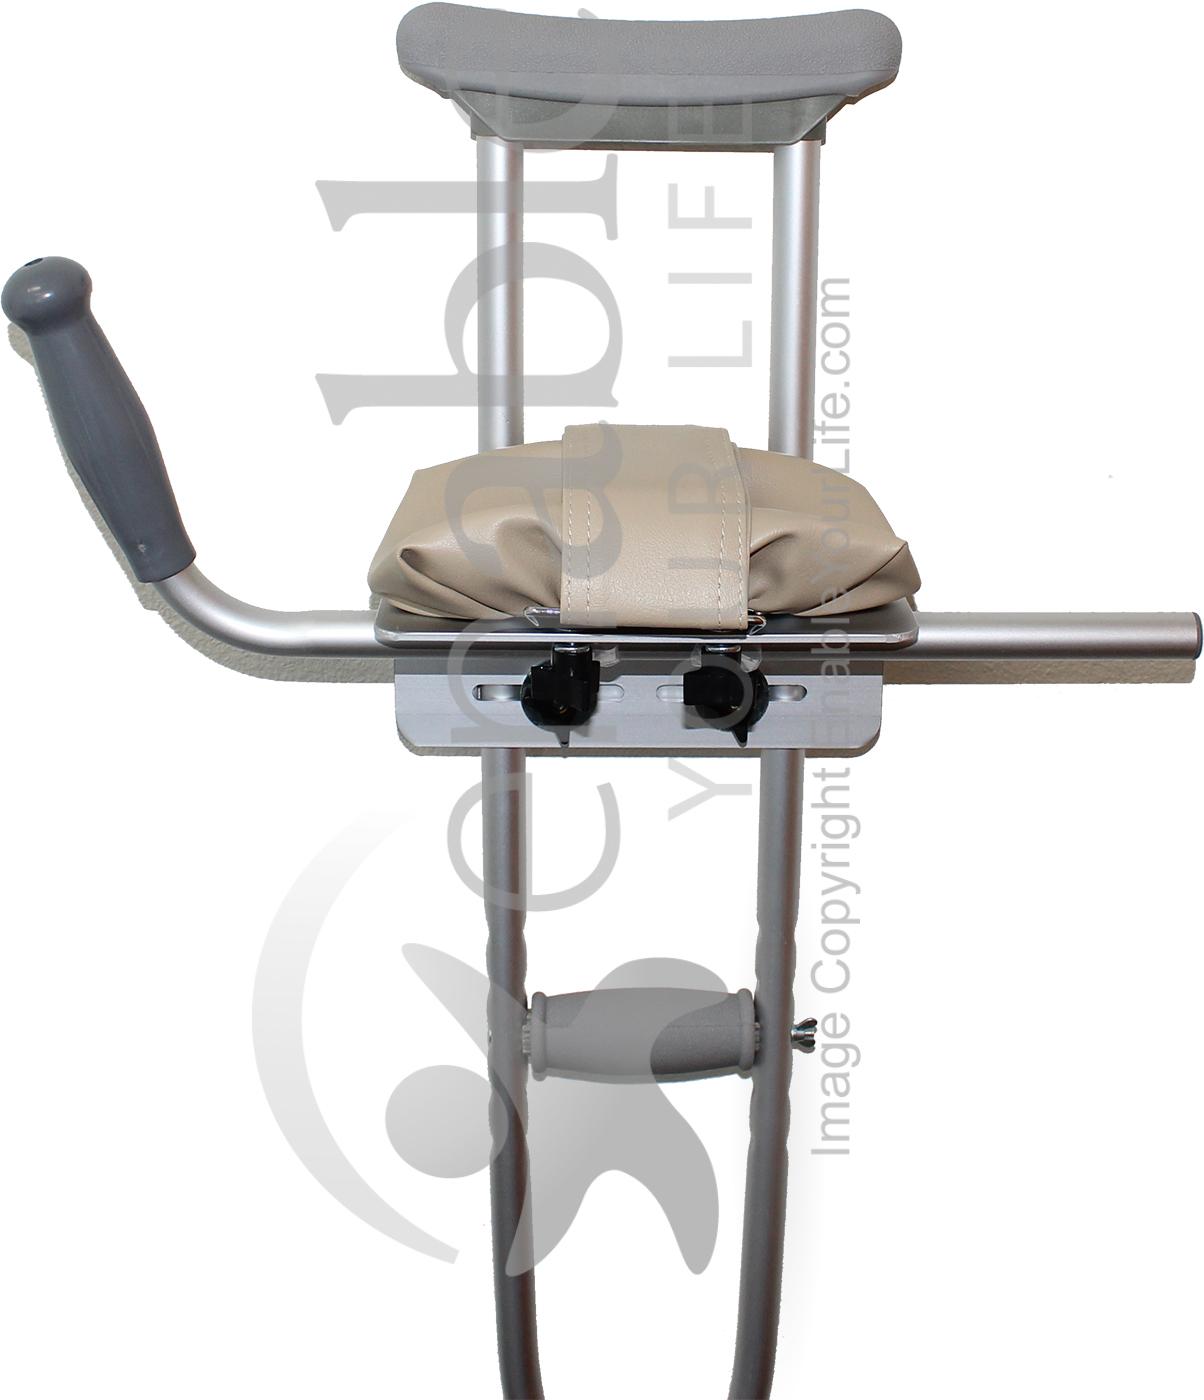 Padded Crutch Platform Attachment Guardian